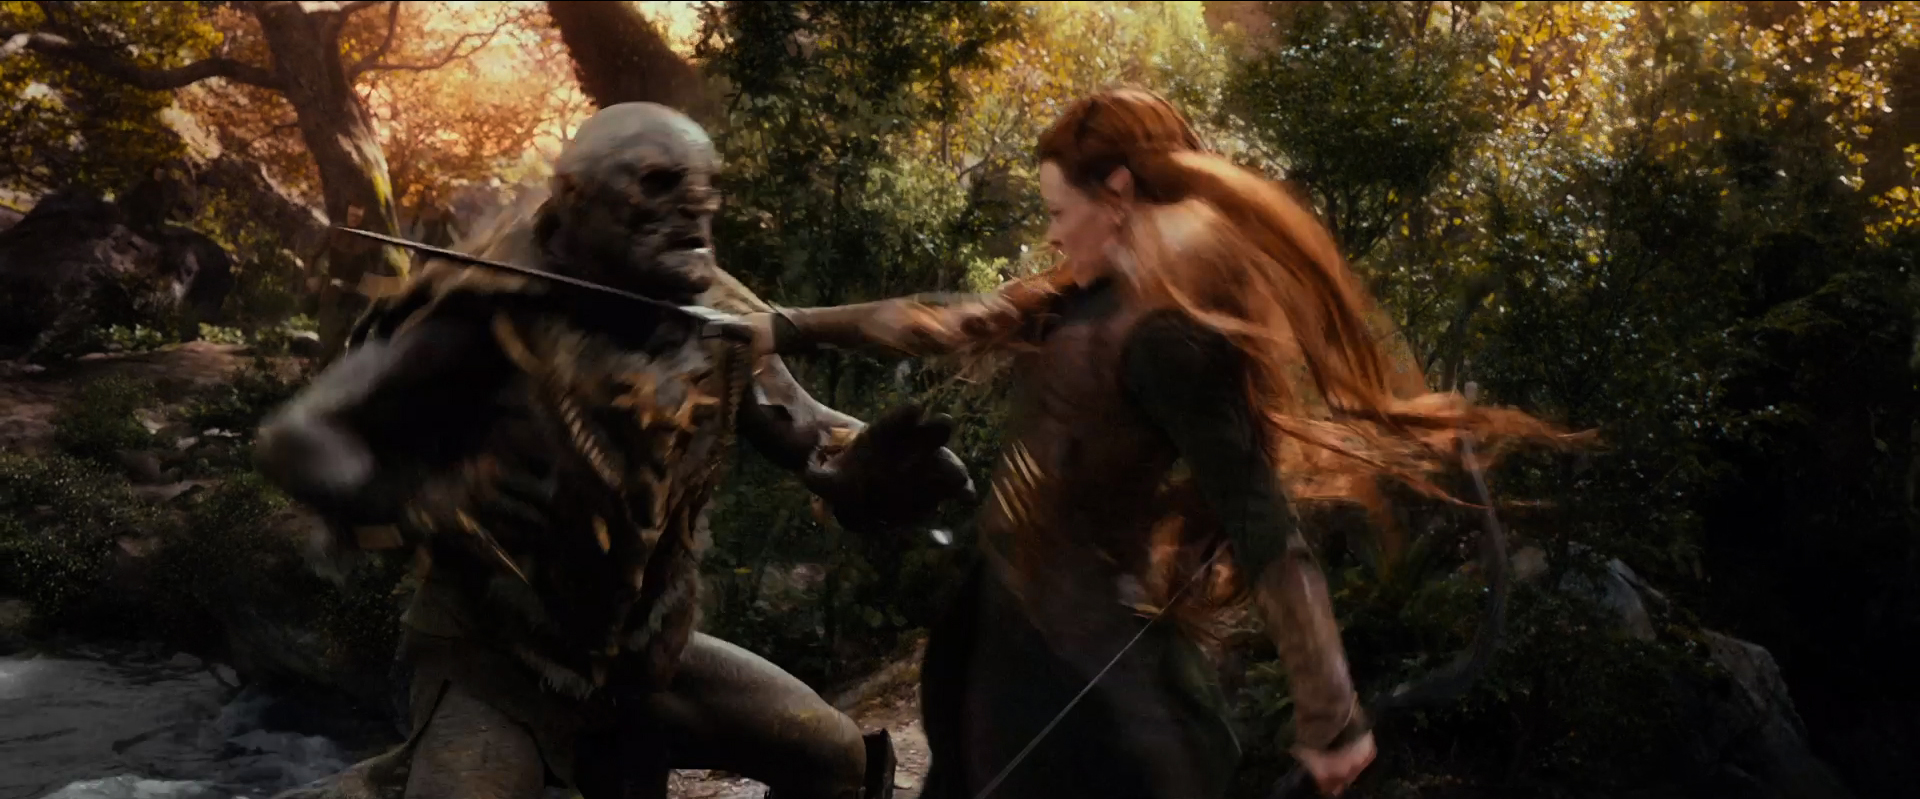 The Hobbit Trailer Analysis - The Desolation of Smaug ...